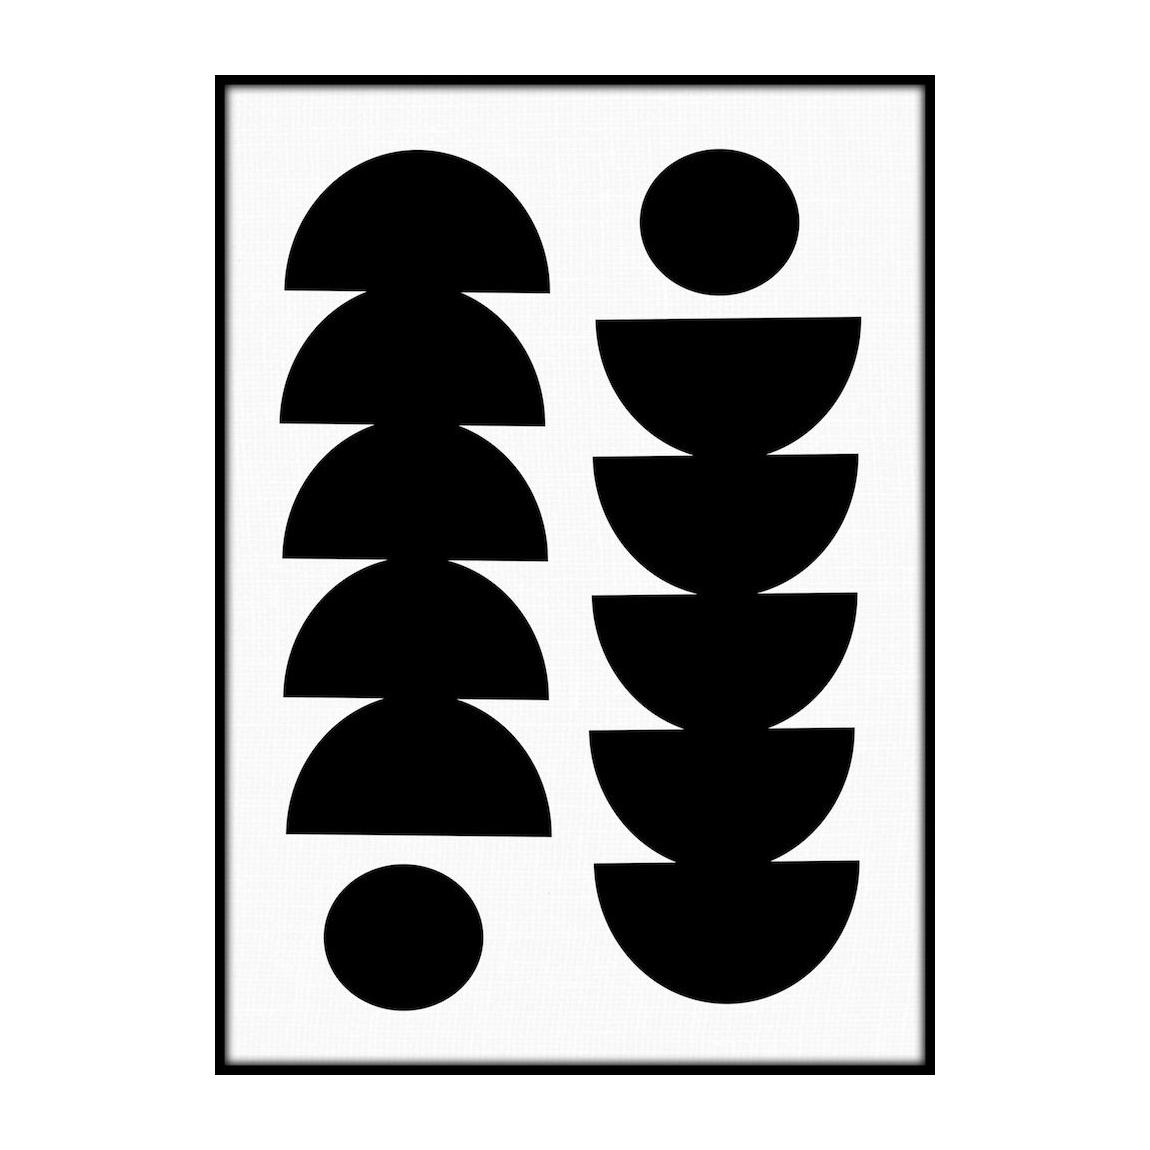 radius vector kablovska IMmh18